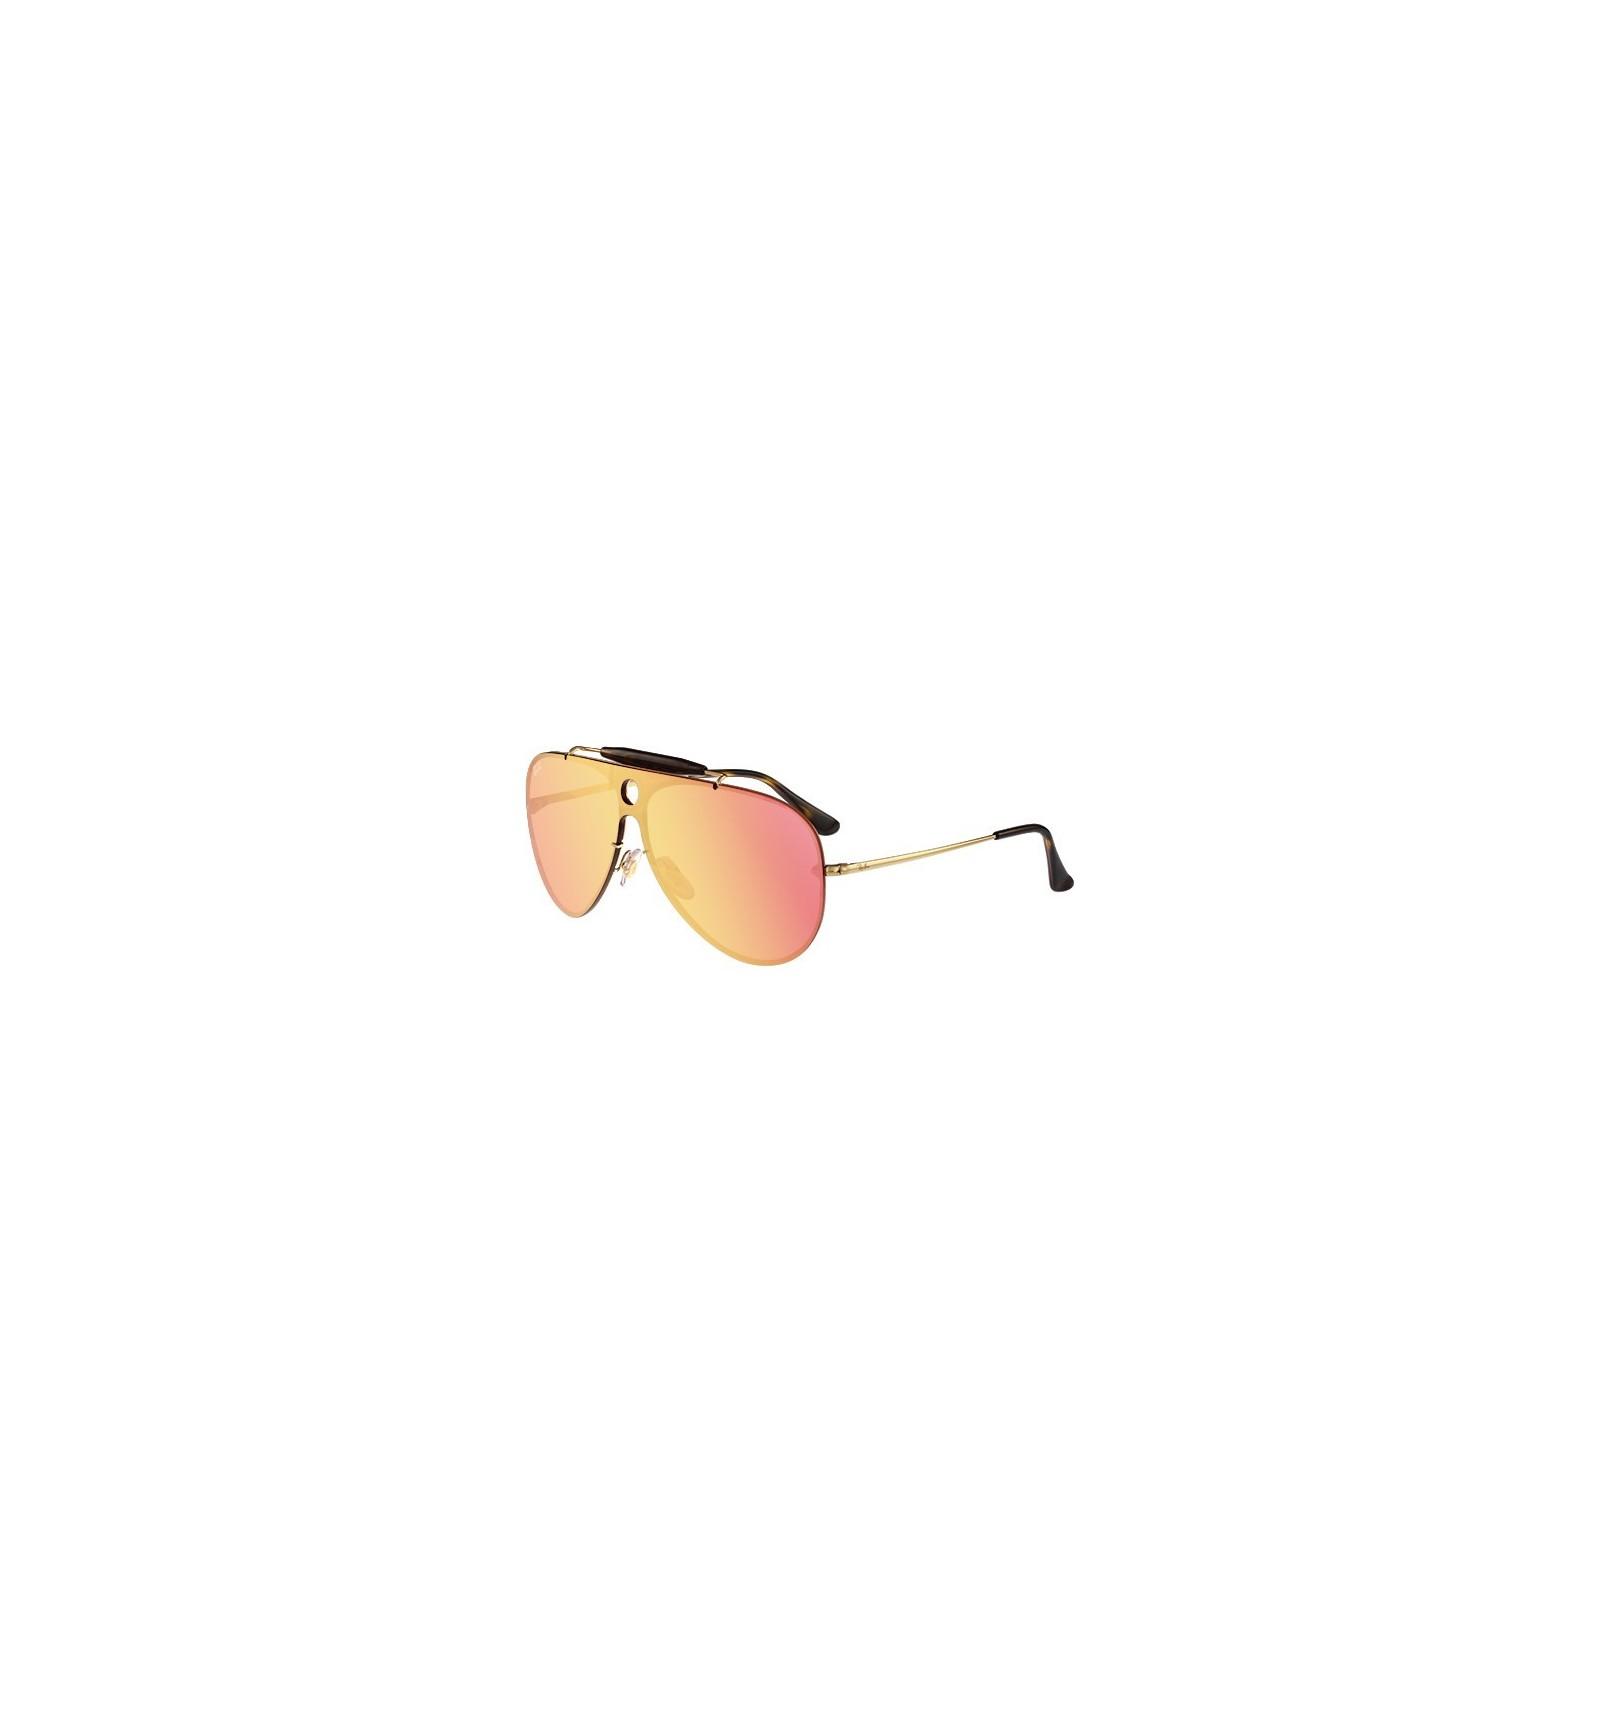 b2d38eea045f2 Gafas de sol RAY BAN RB3581 Blaze Shooter Gold - Pink Mirror